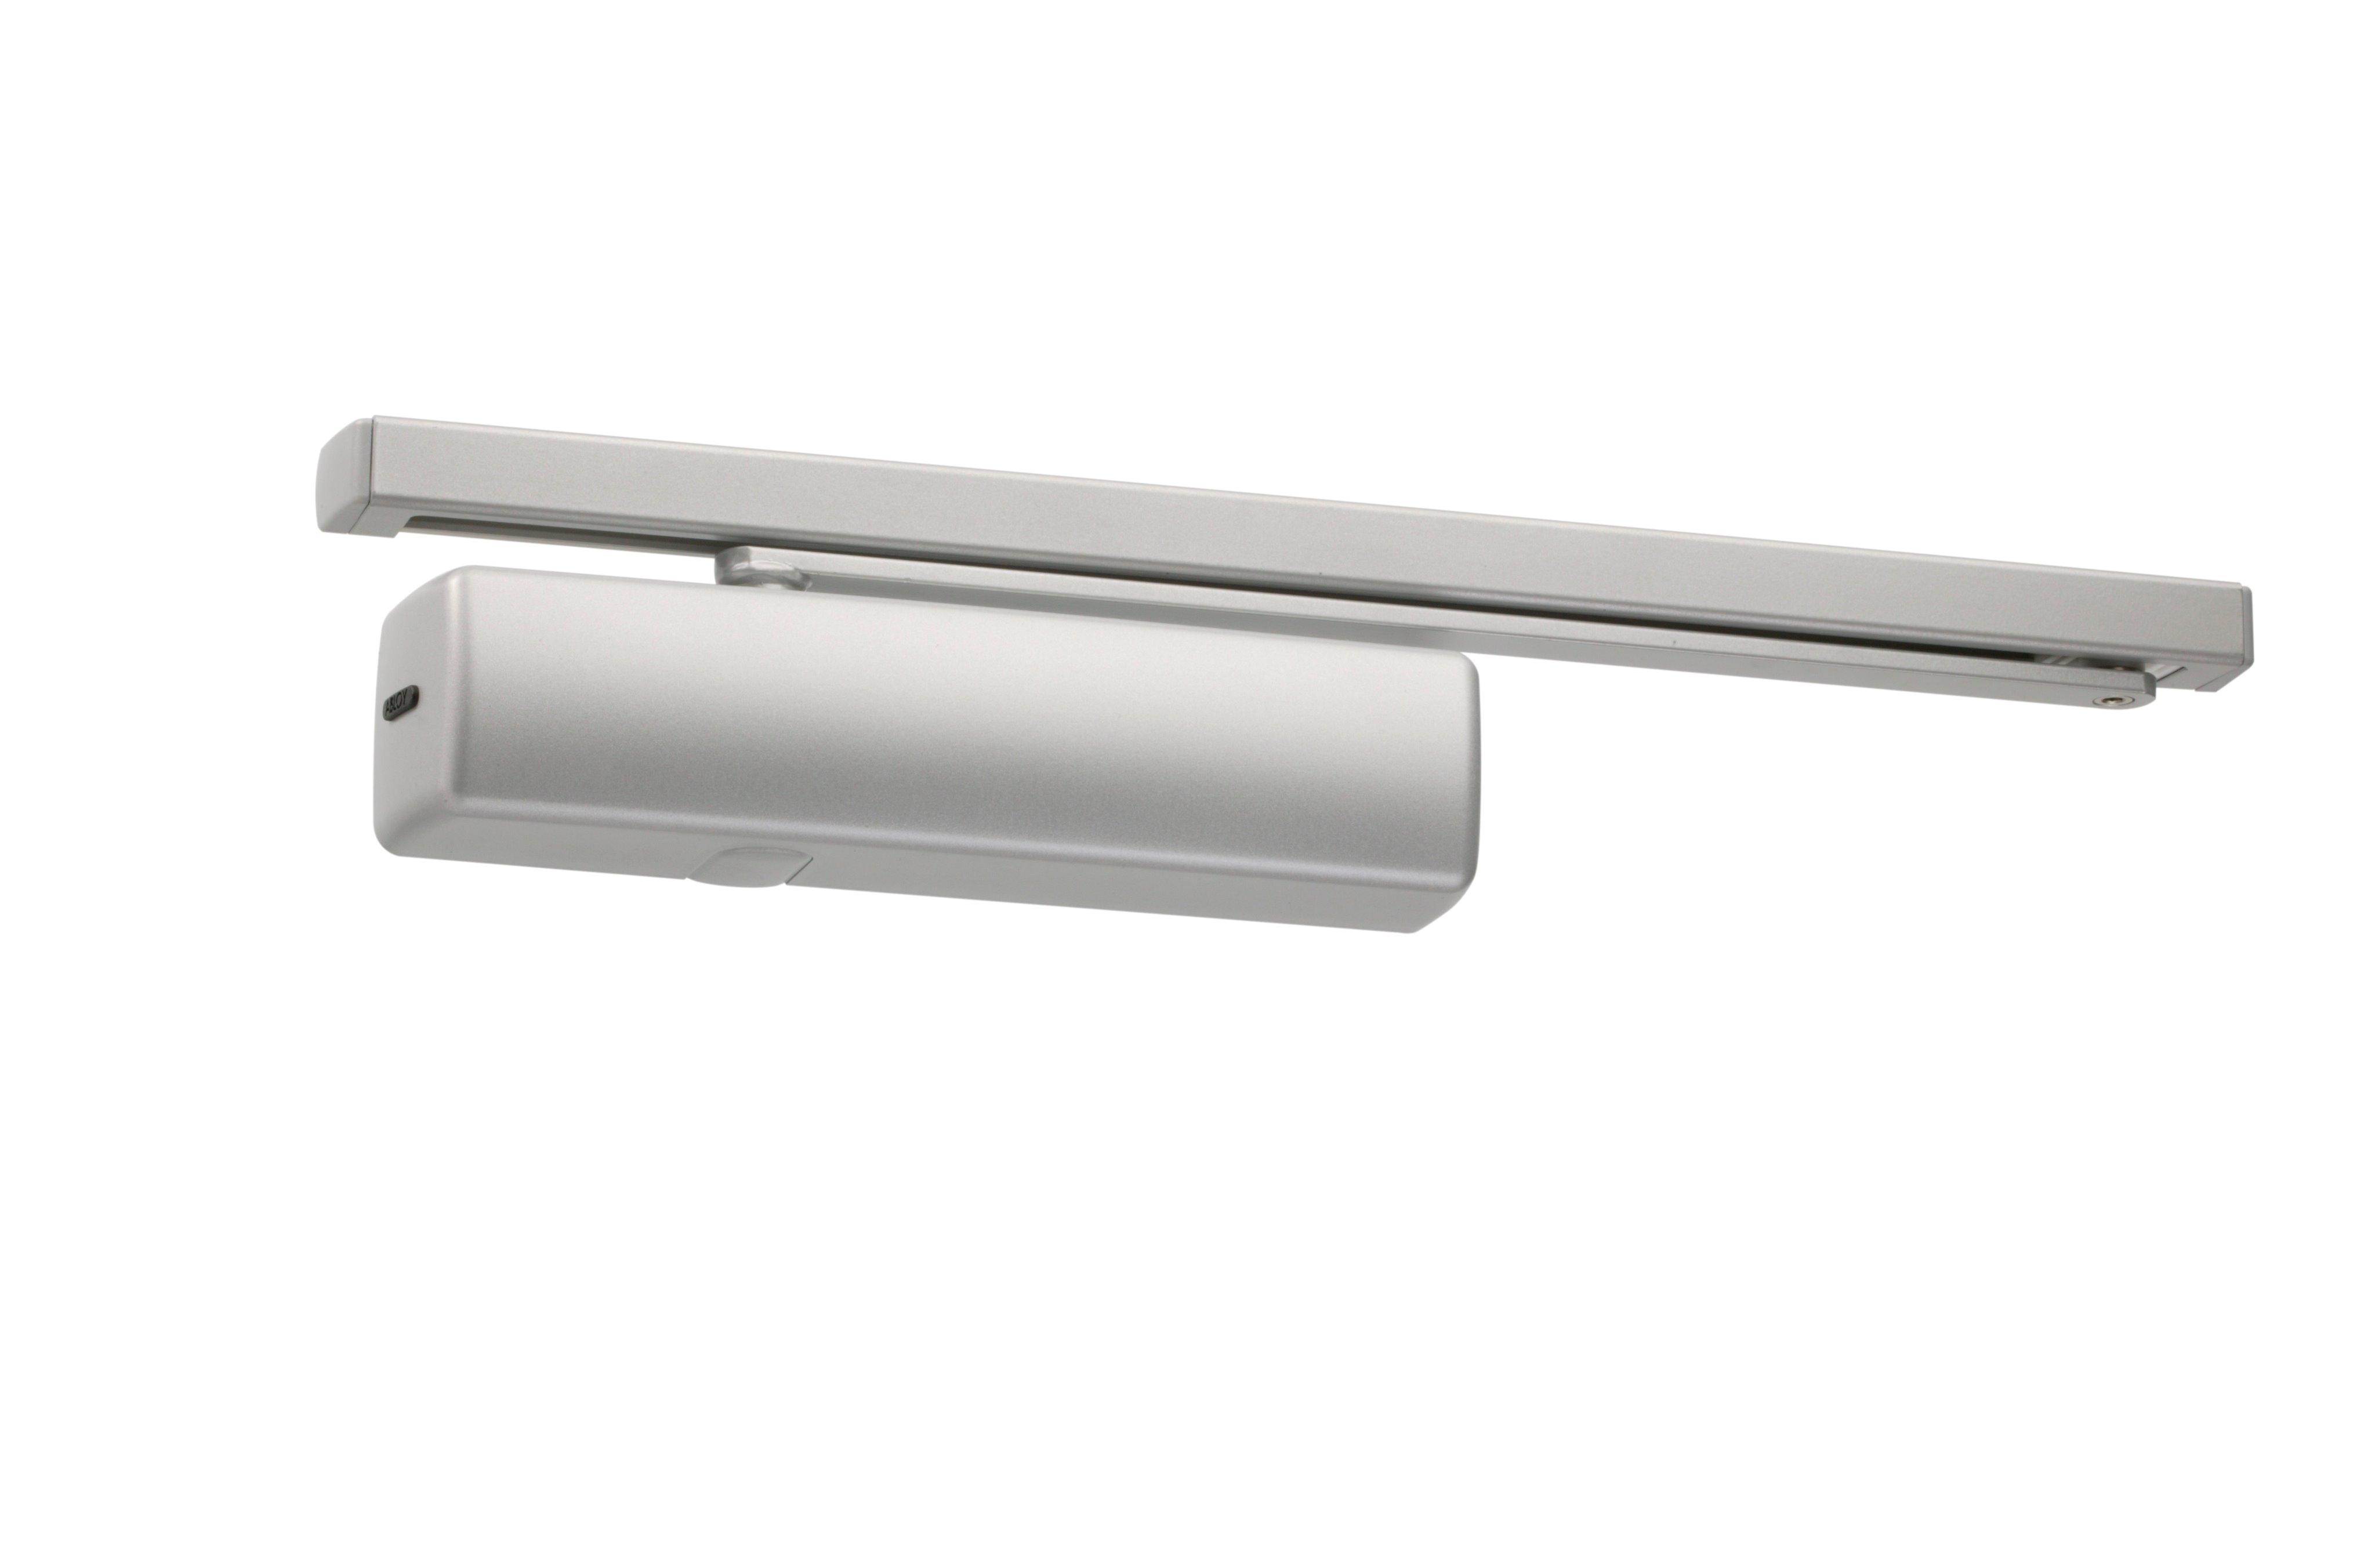 closer hydraulic star adjust sliding door glass automatic overhead four handballtunisie wooden l org